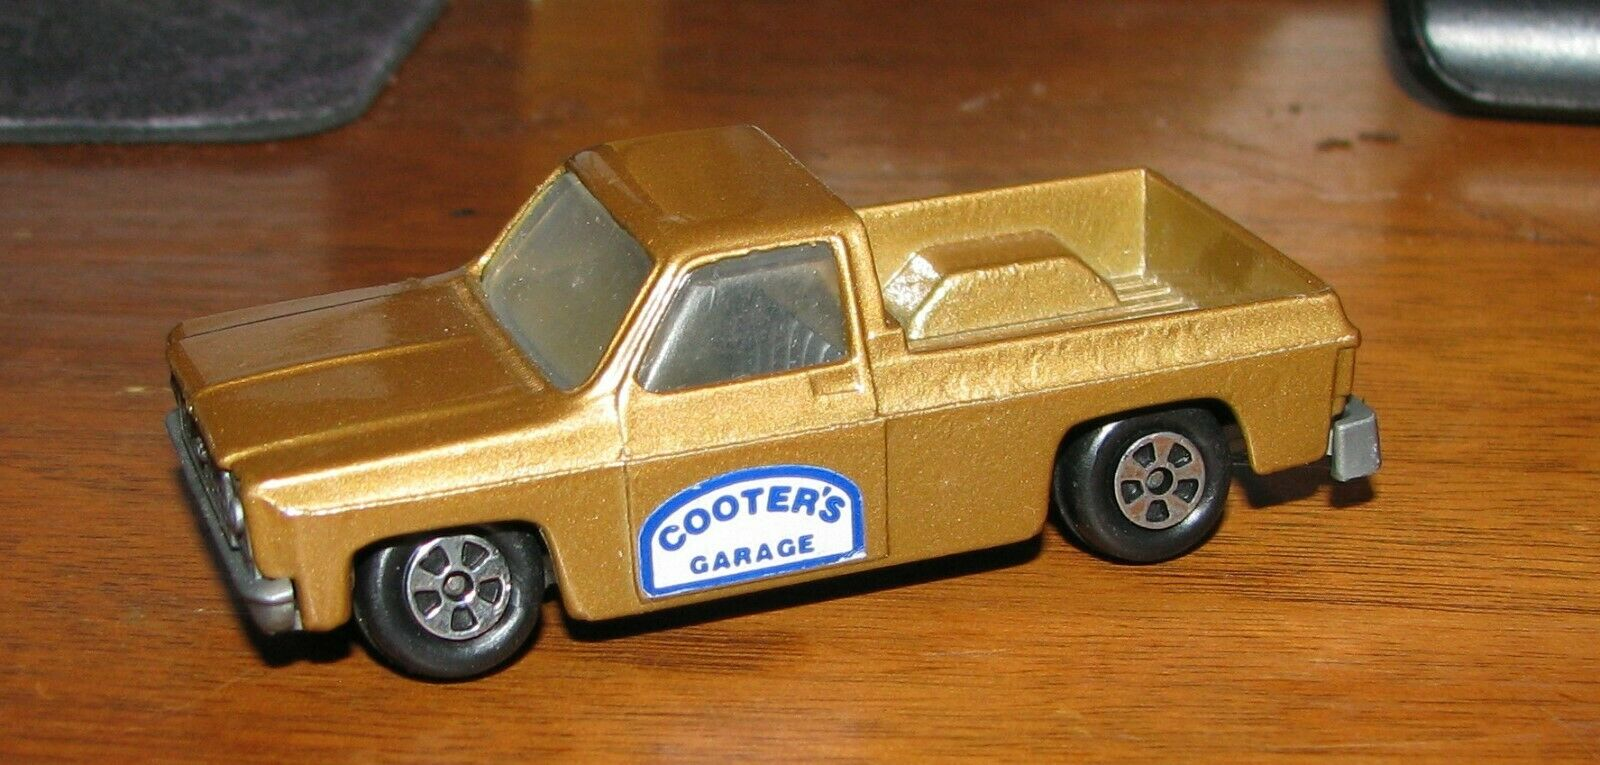 Super RARE ERTL Dukes of Hazzard Cooters Garage Stepside Chevy Truck